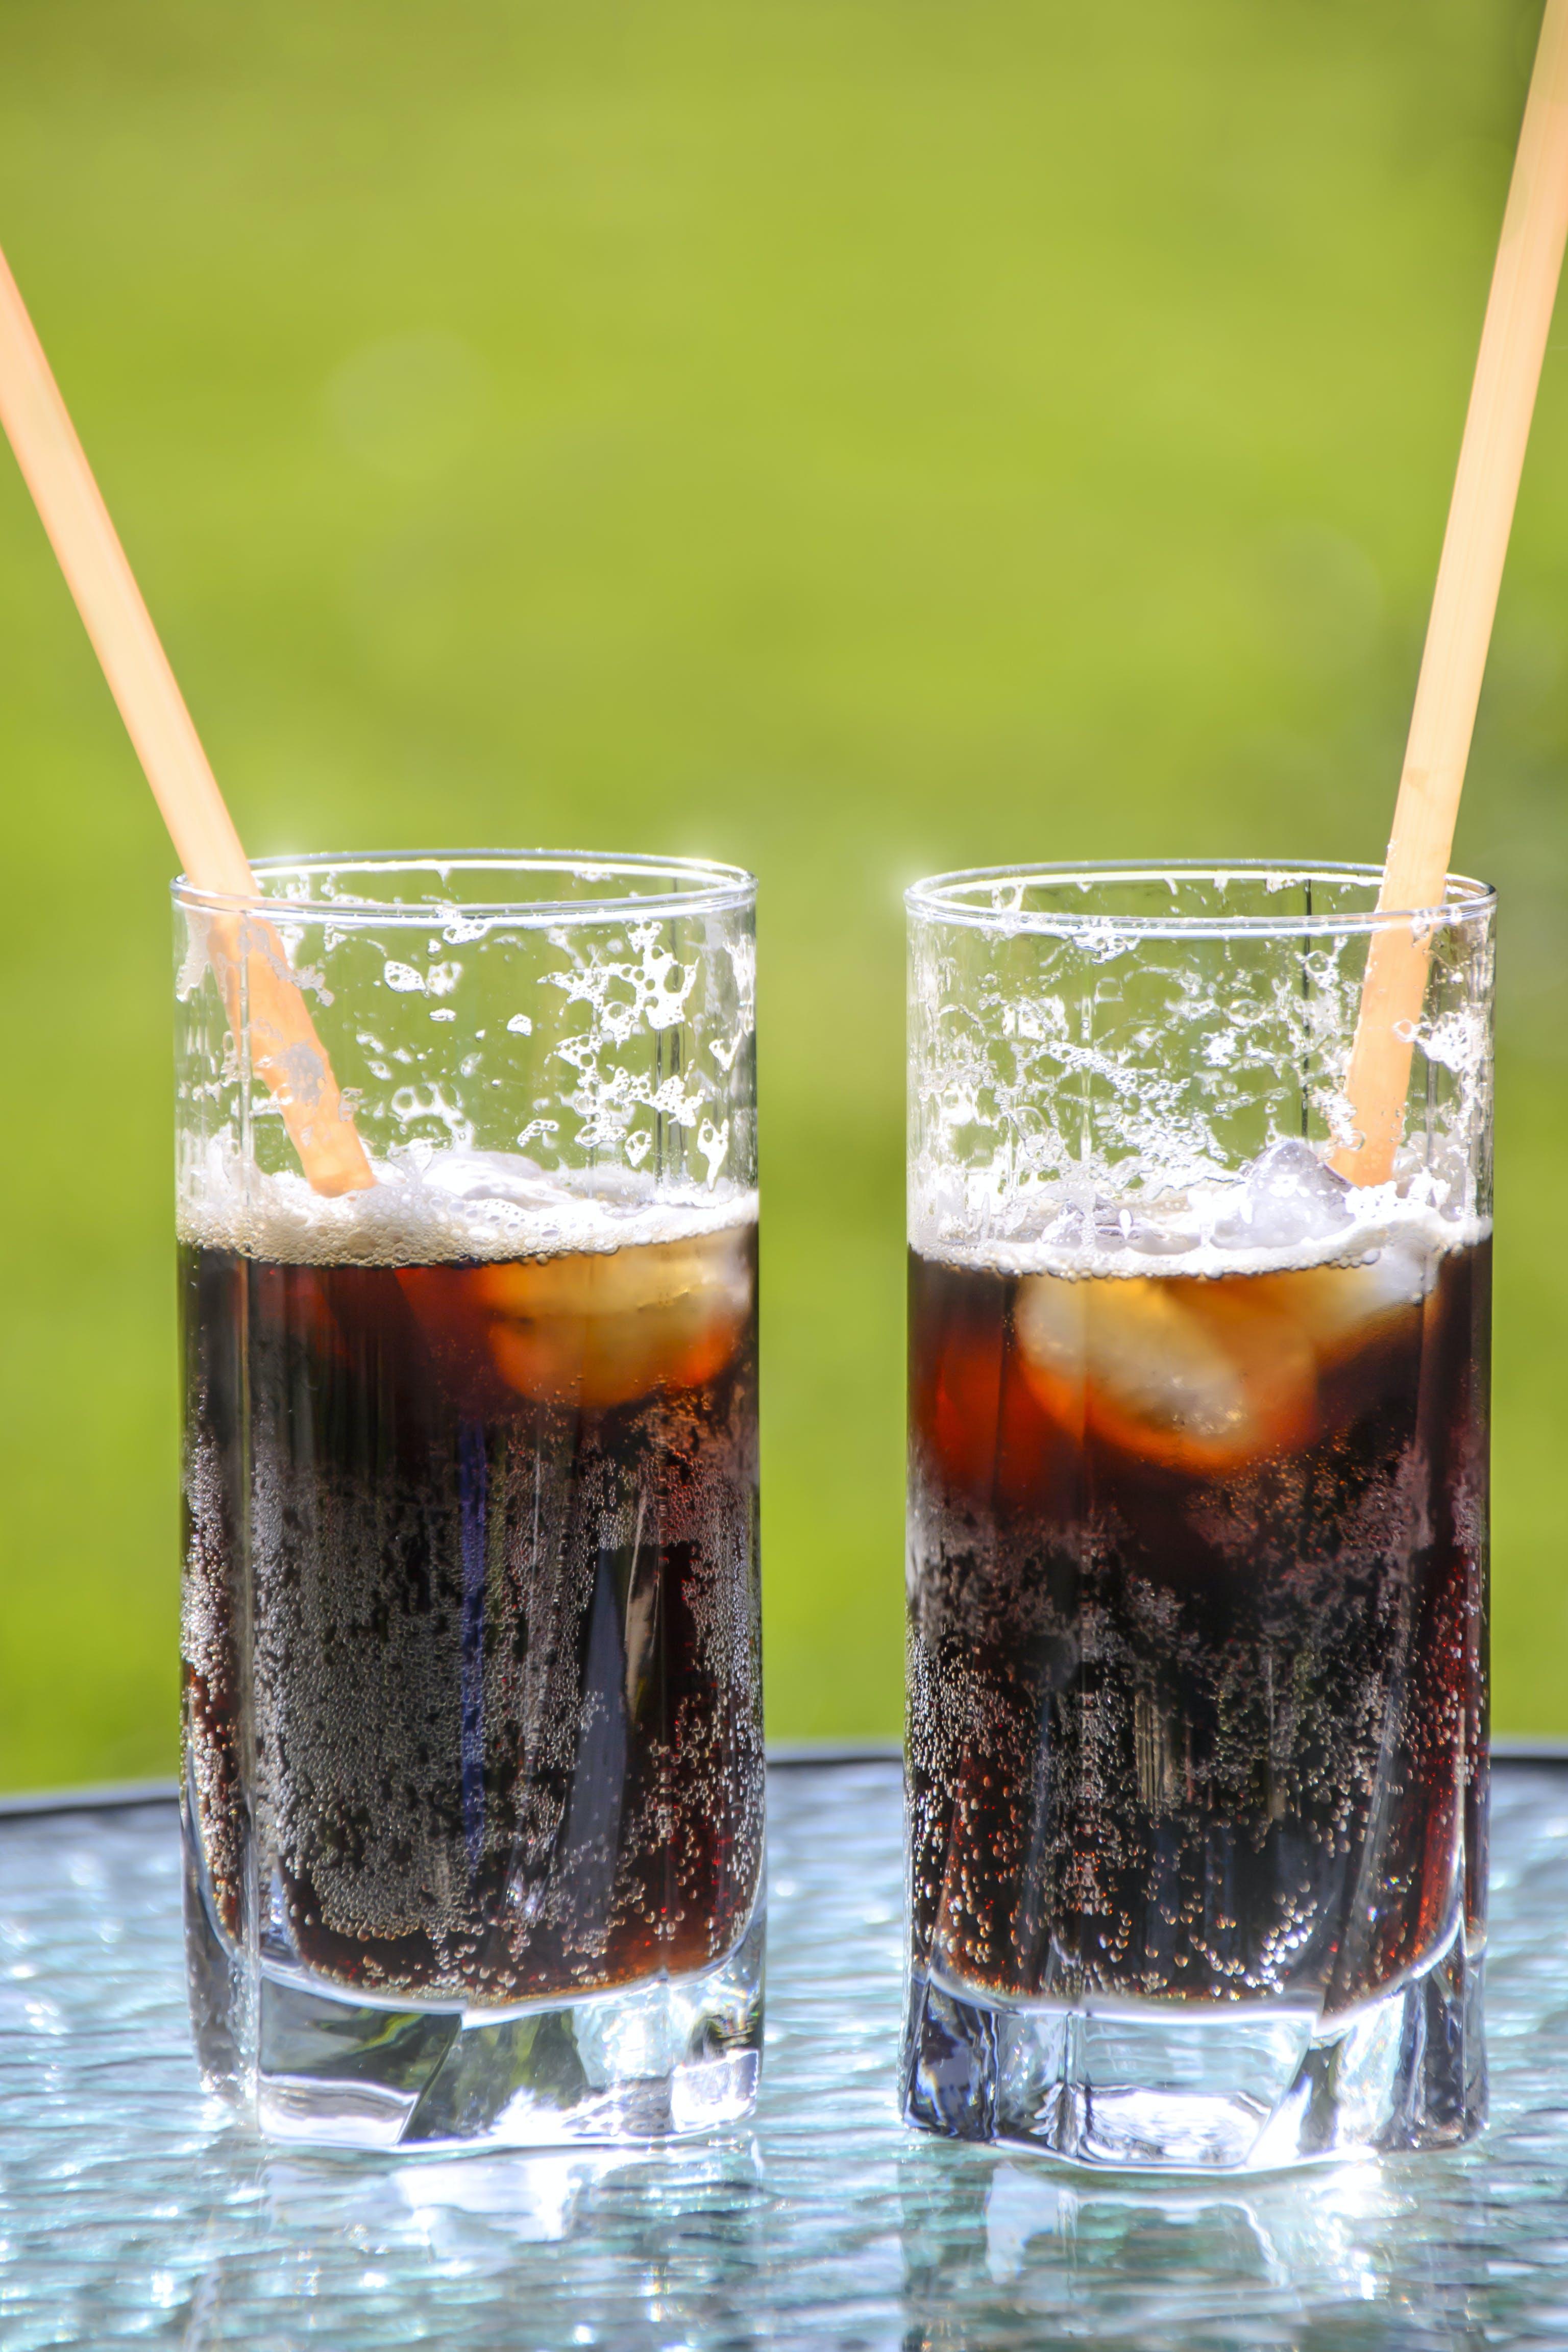 aperitivo, bebida, bolha